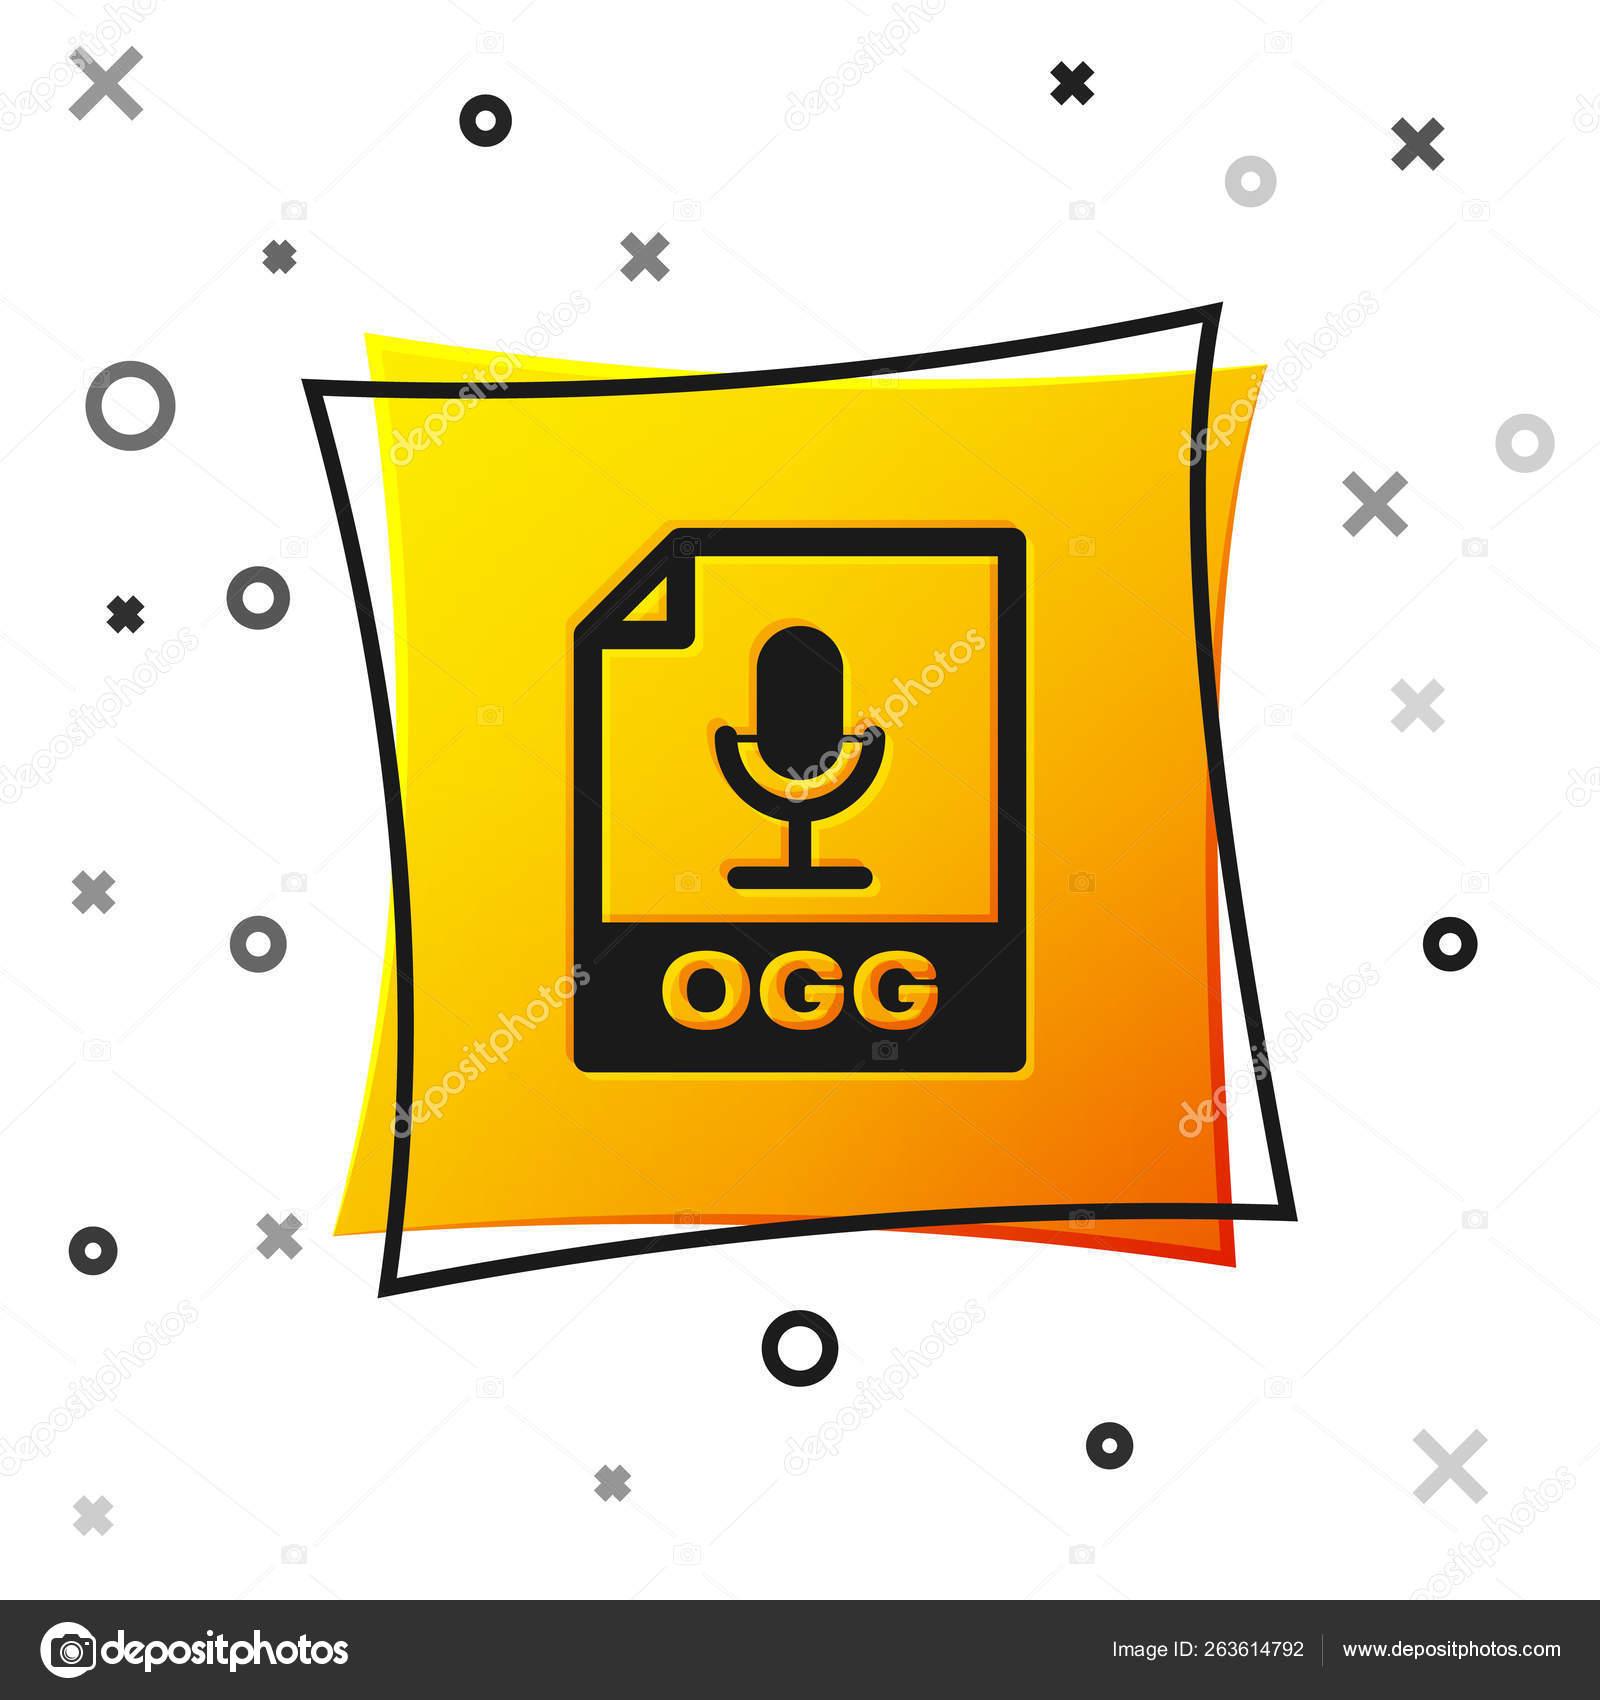 Black OGG file document icon  Download ogg button icon